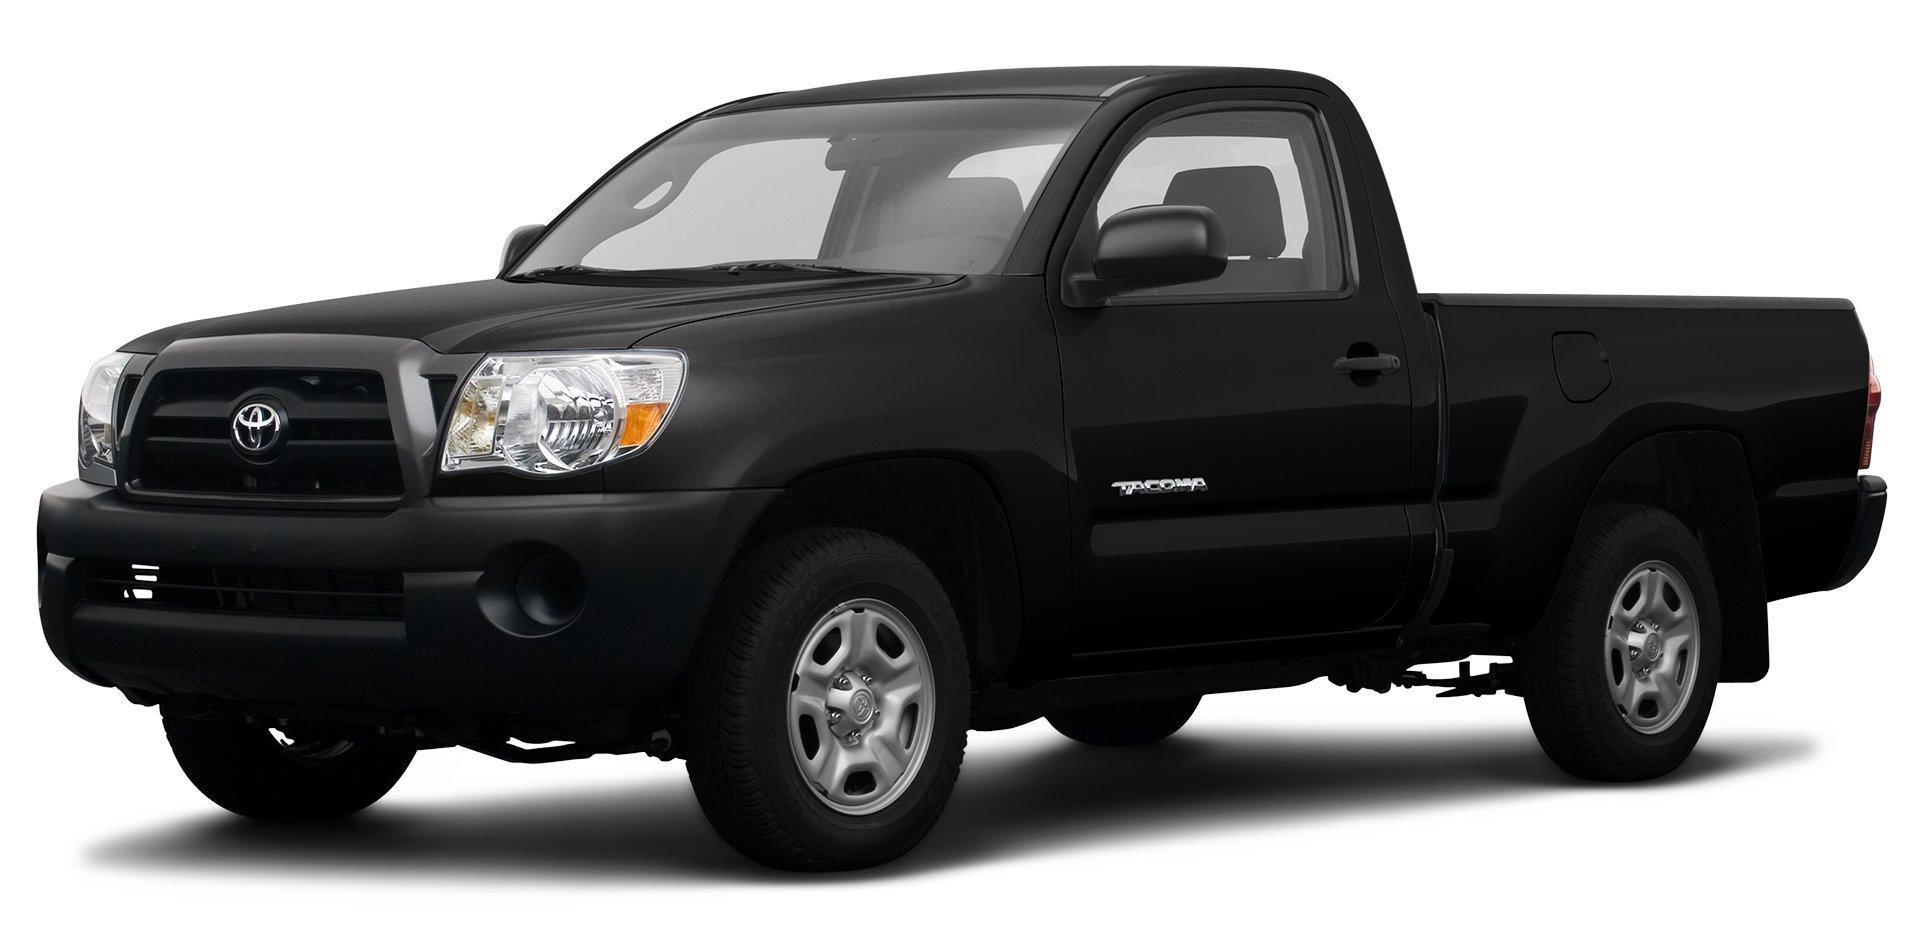 2008 mazda b2300 2 wheel drive regular cab automatic transmission 2008 toyota tacoma 2 wheel drive regular cab 4 cylinder automatic transmission